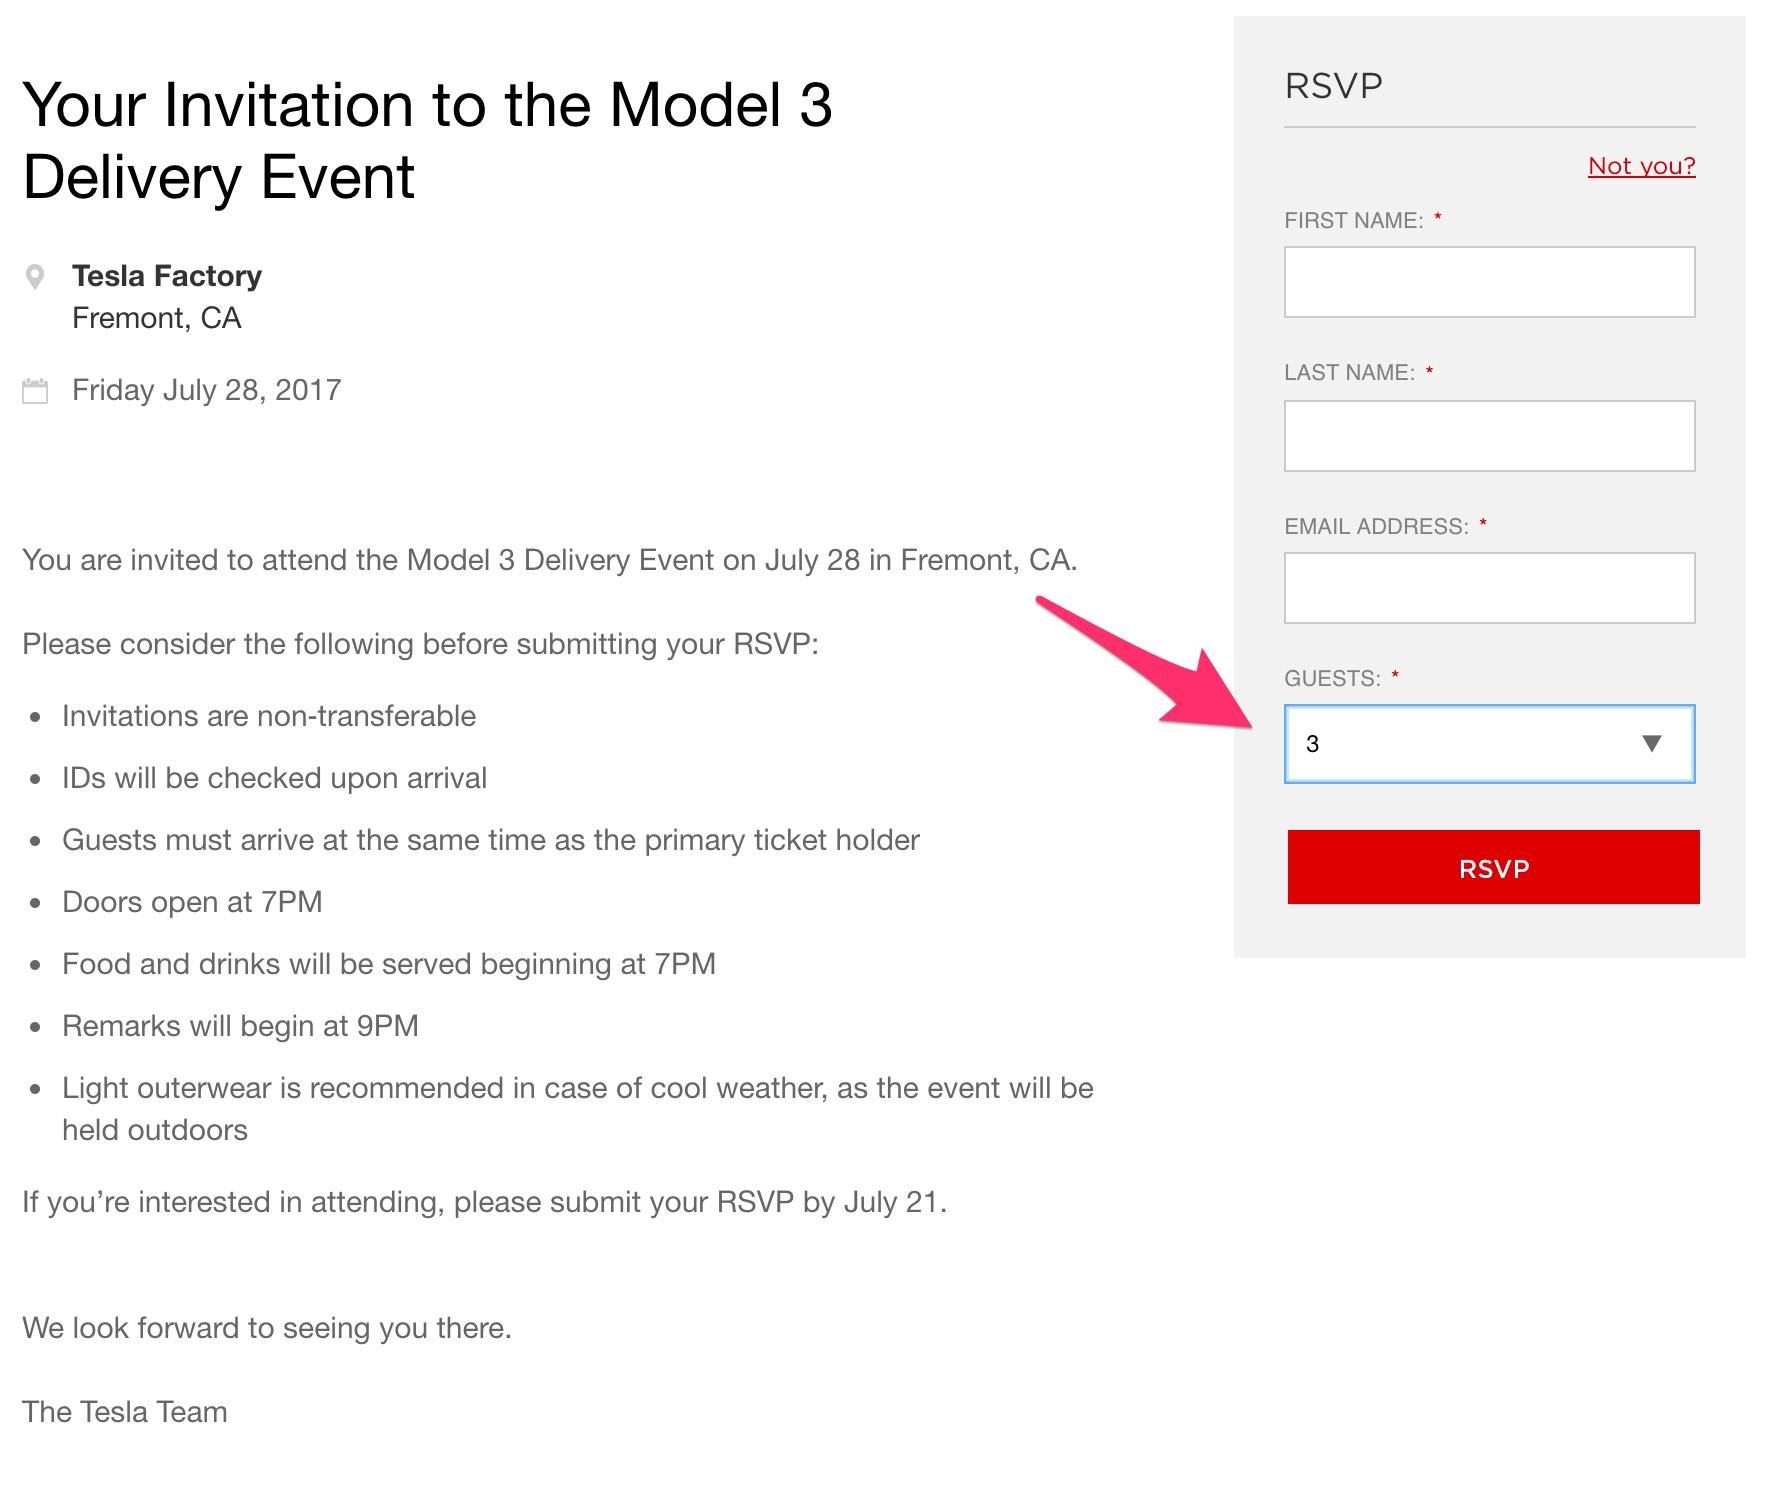 tesla-model-3-delivery-event-invitation-guests